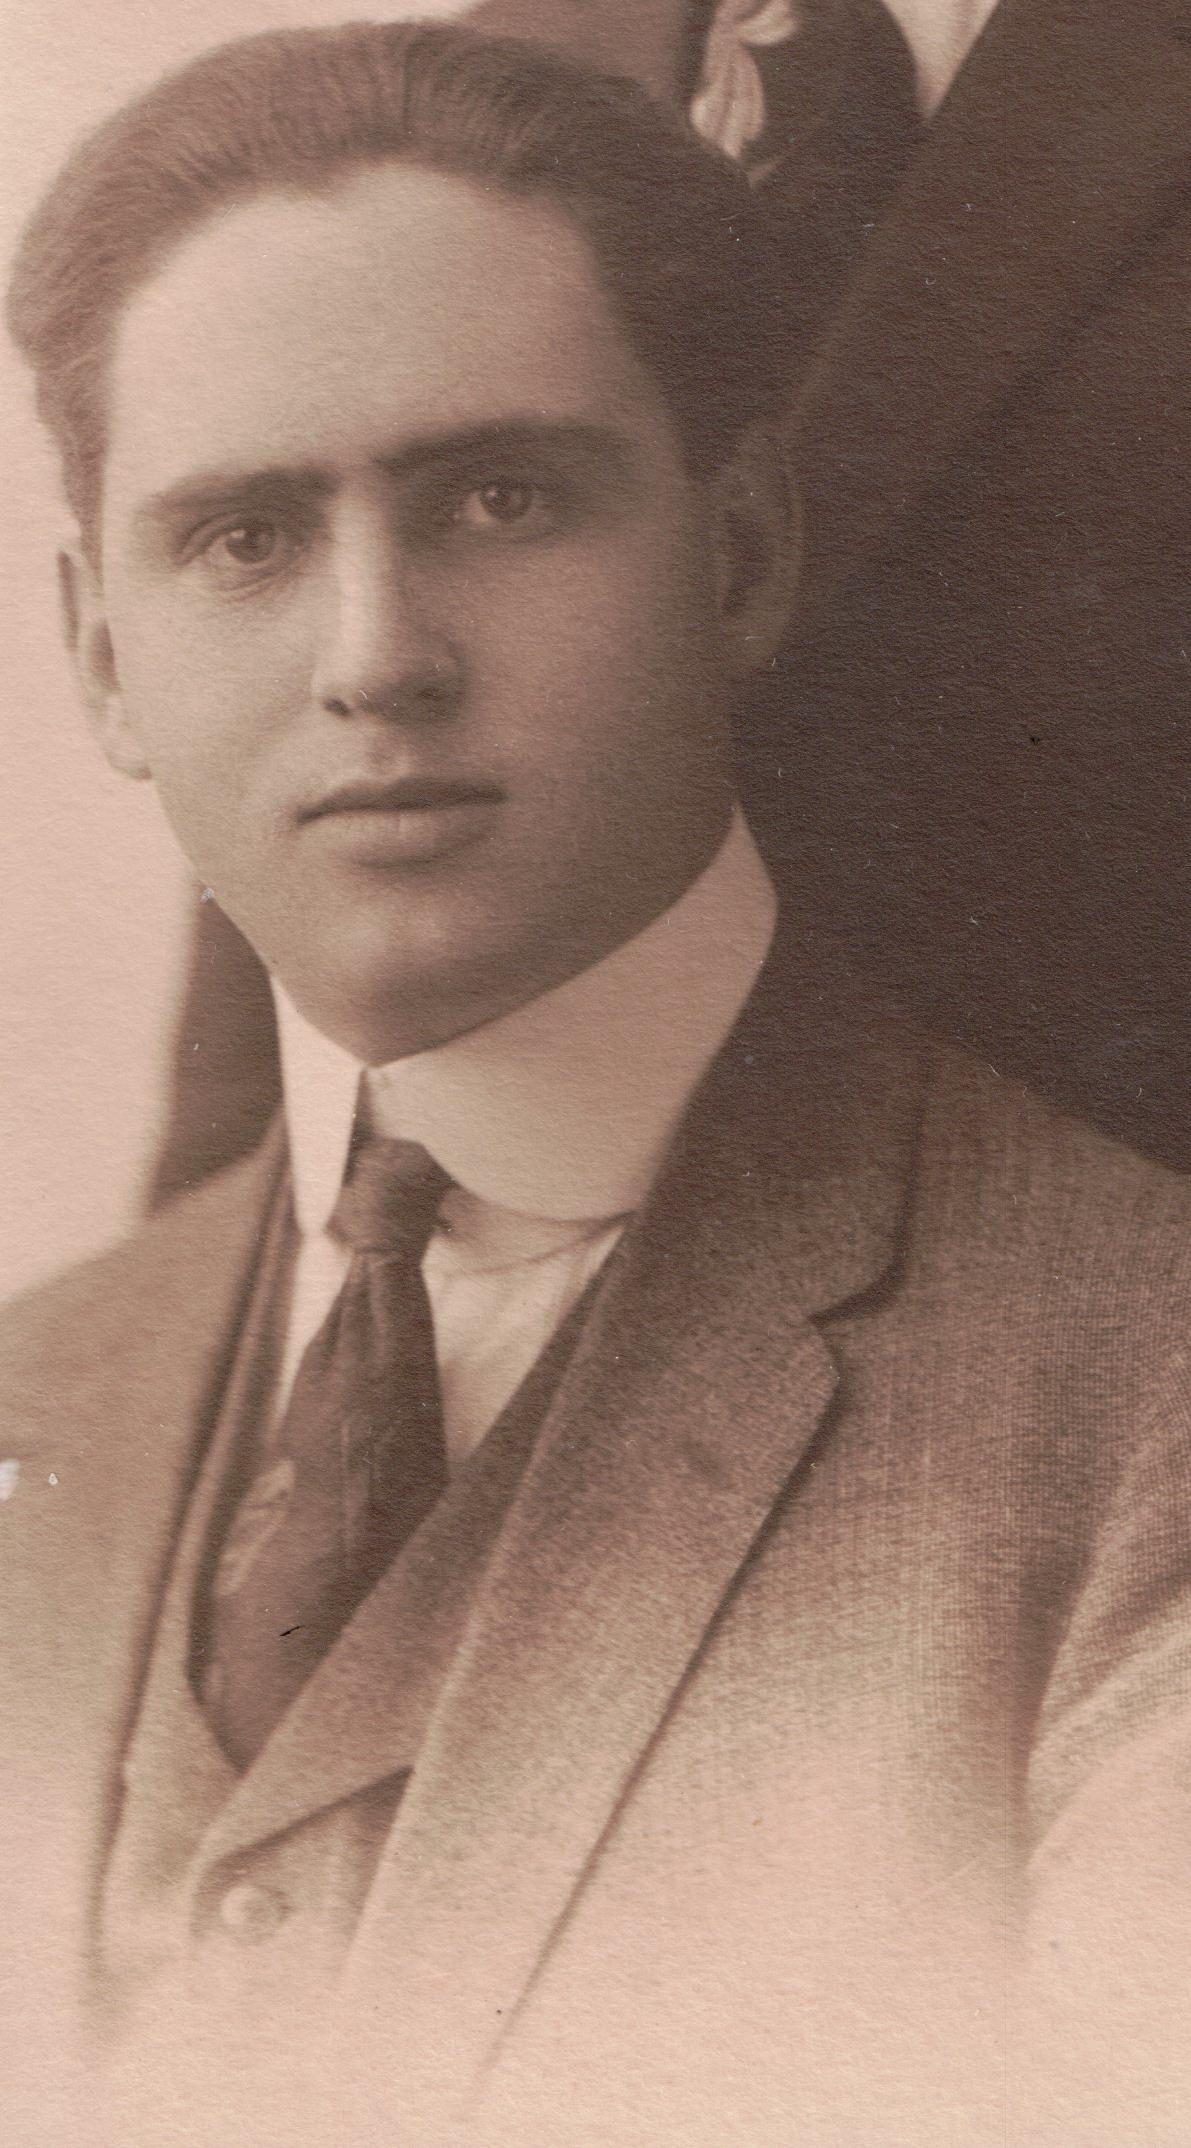 Homer Lewis Guiler